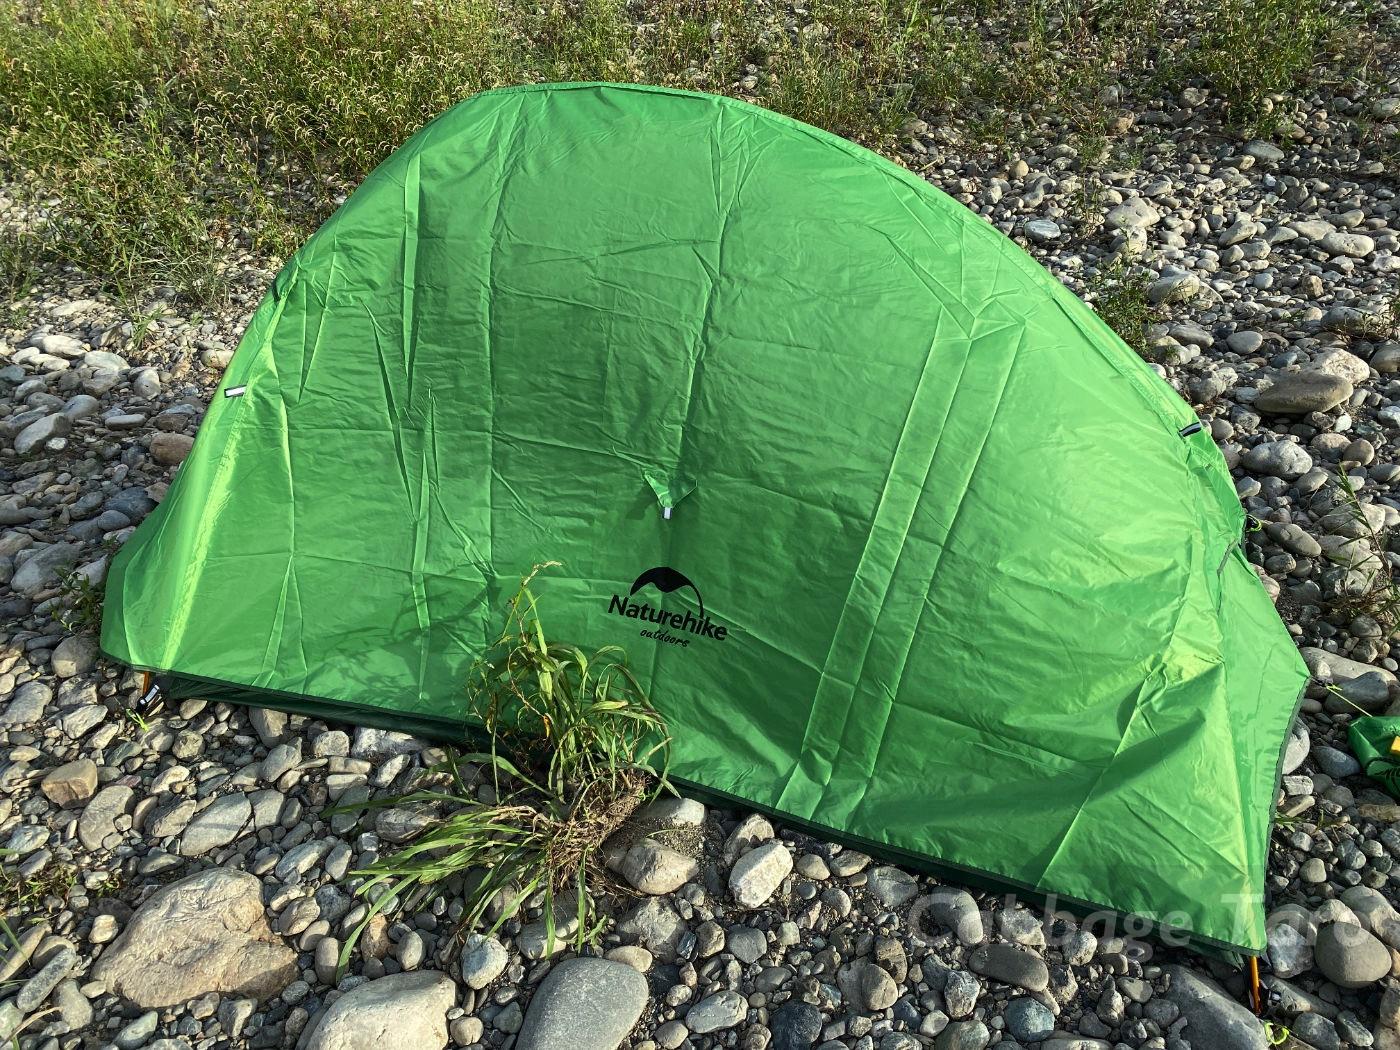 Naturehike tent cloudup2x review 03